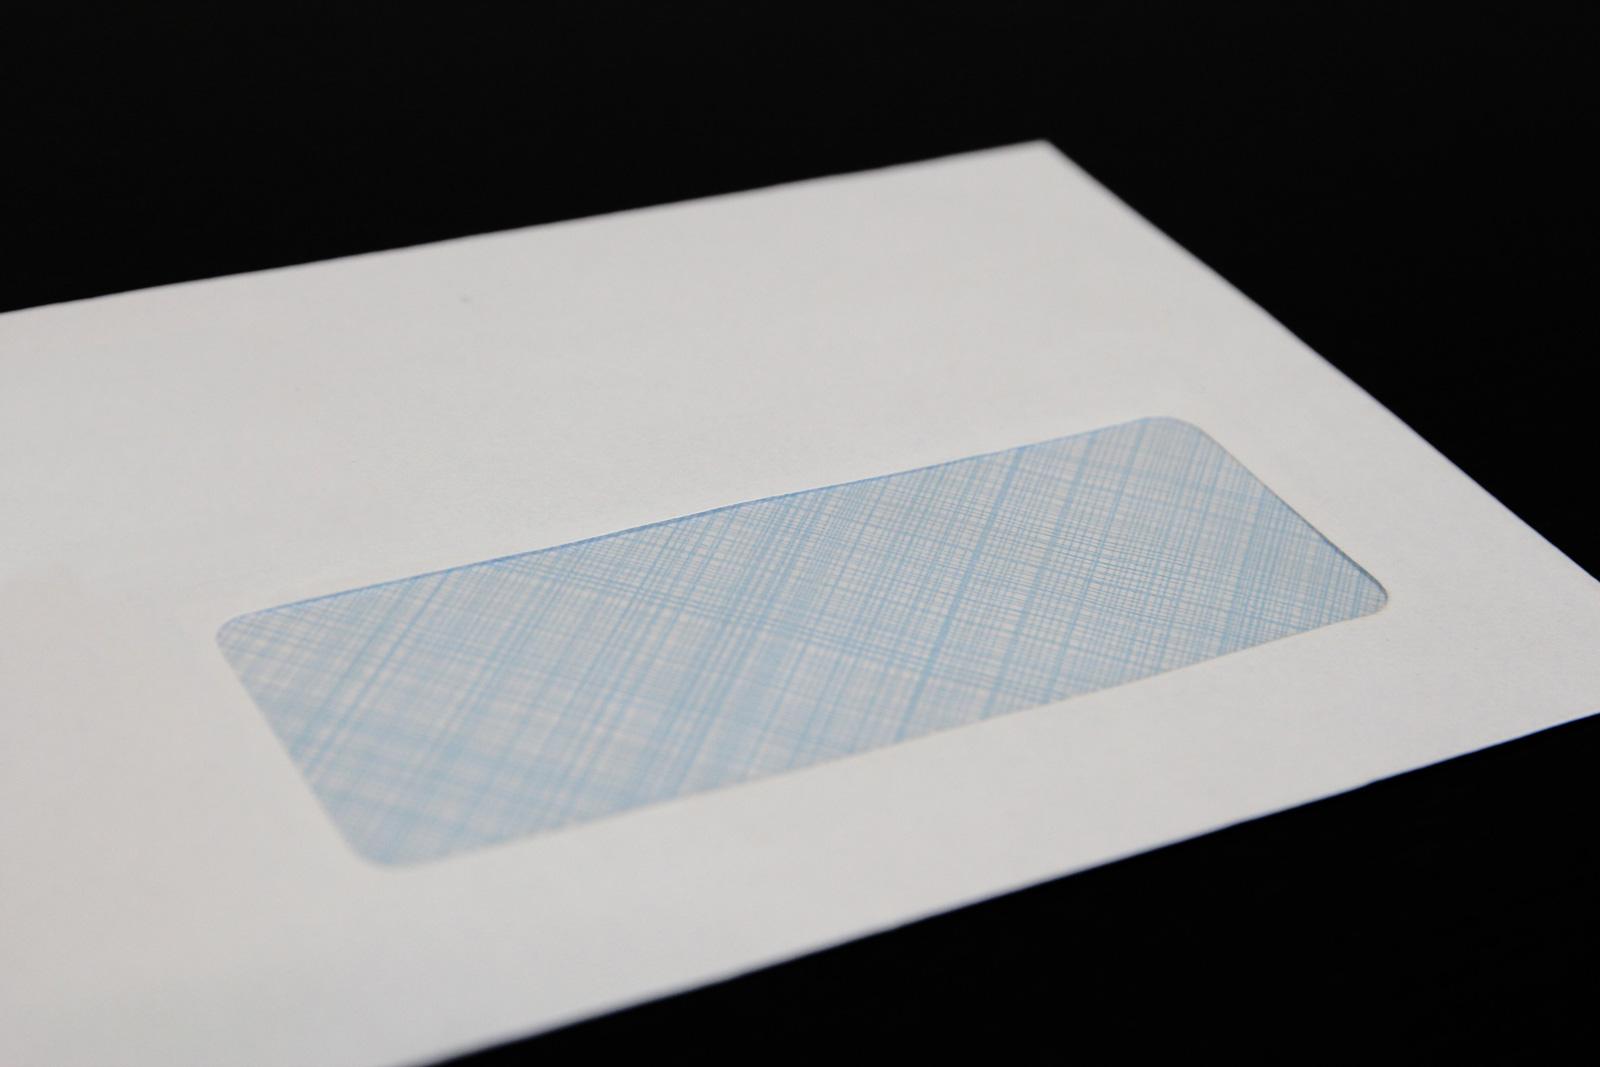 Impression enveloppes 110x220 format 110x220 dl avec for Enveloppe a fenetre